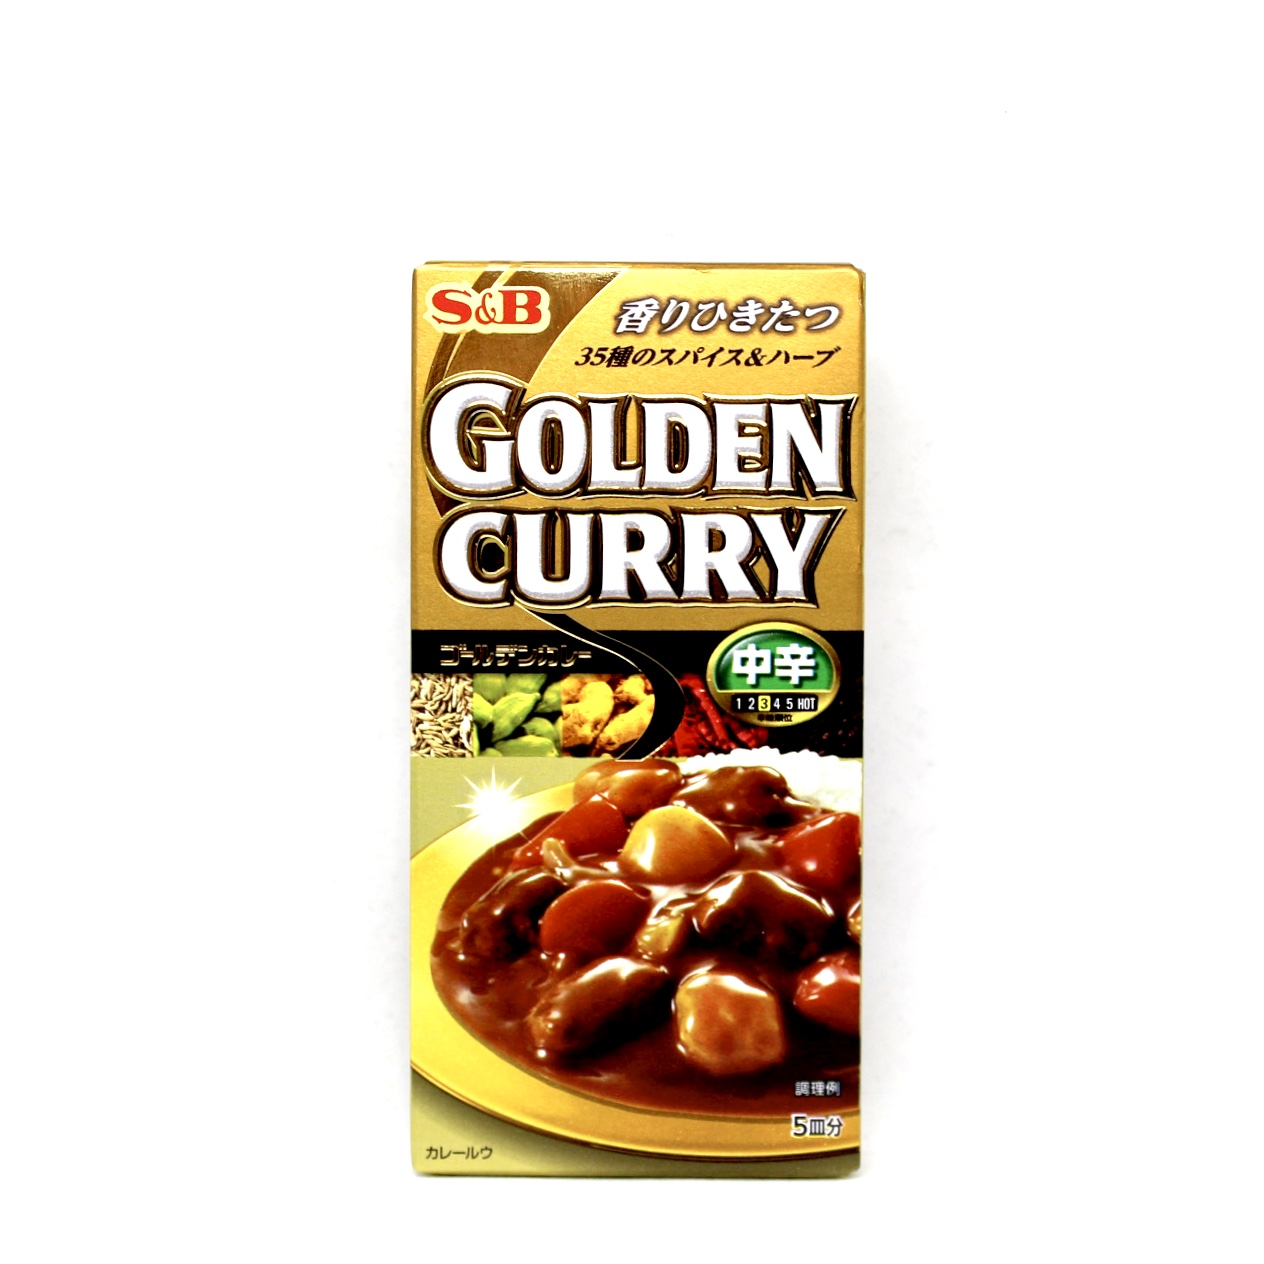 S E B GOLDEN CURRY CHUKARA 90g